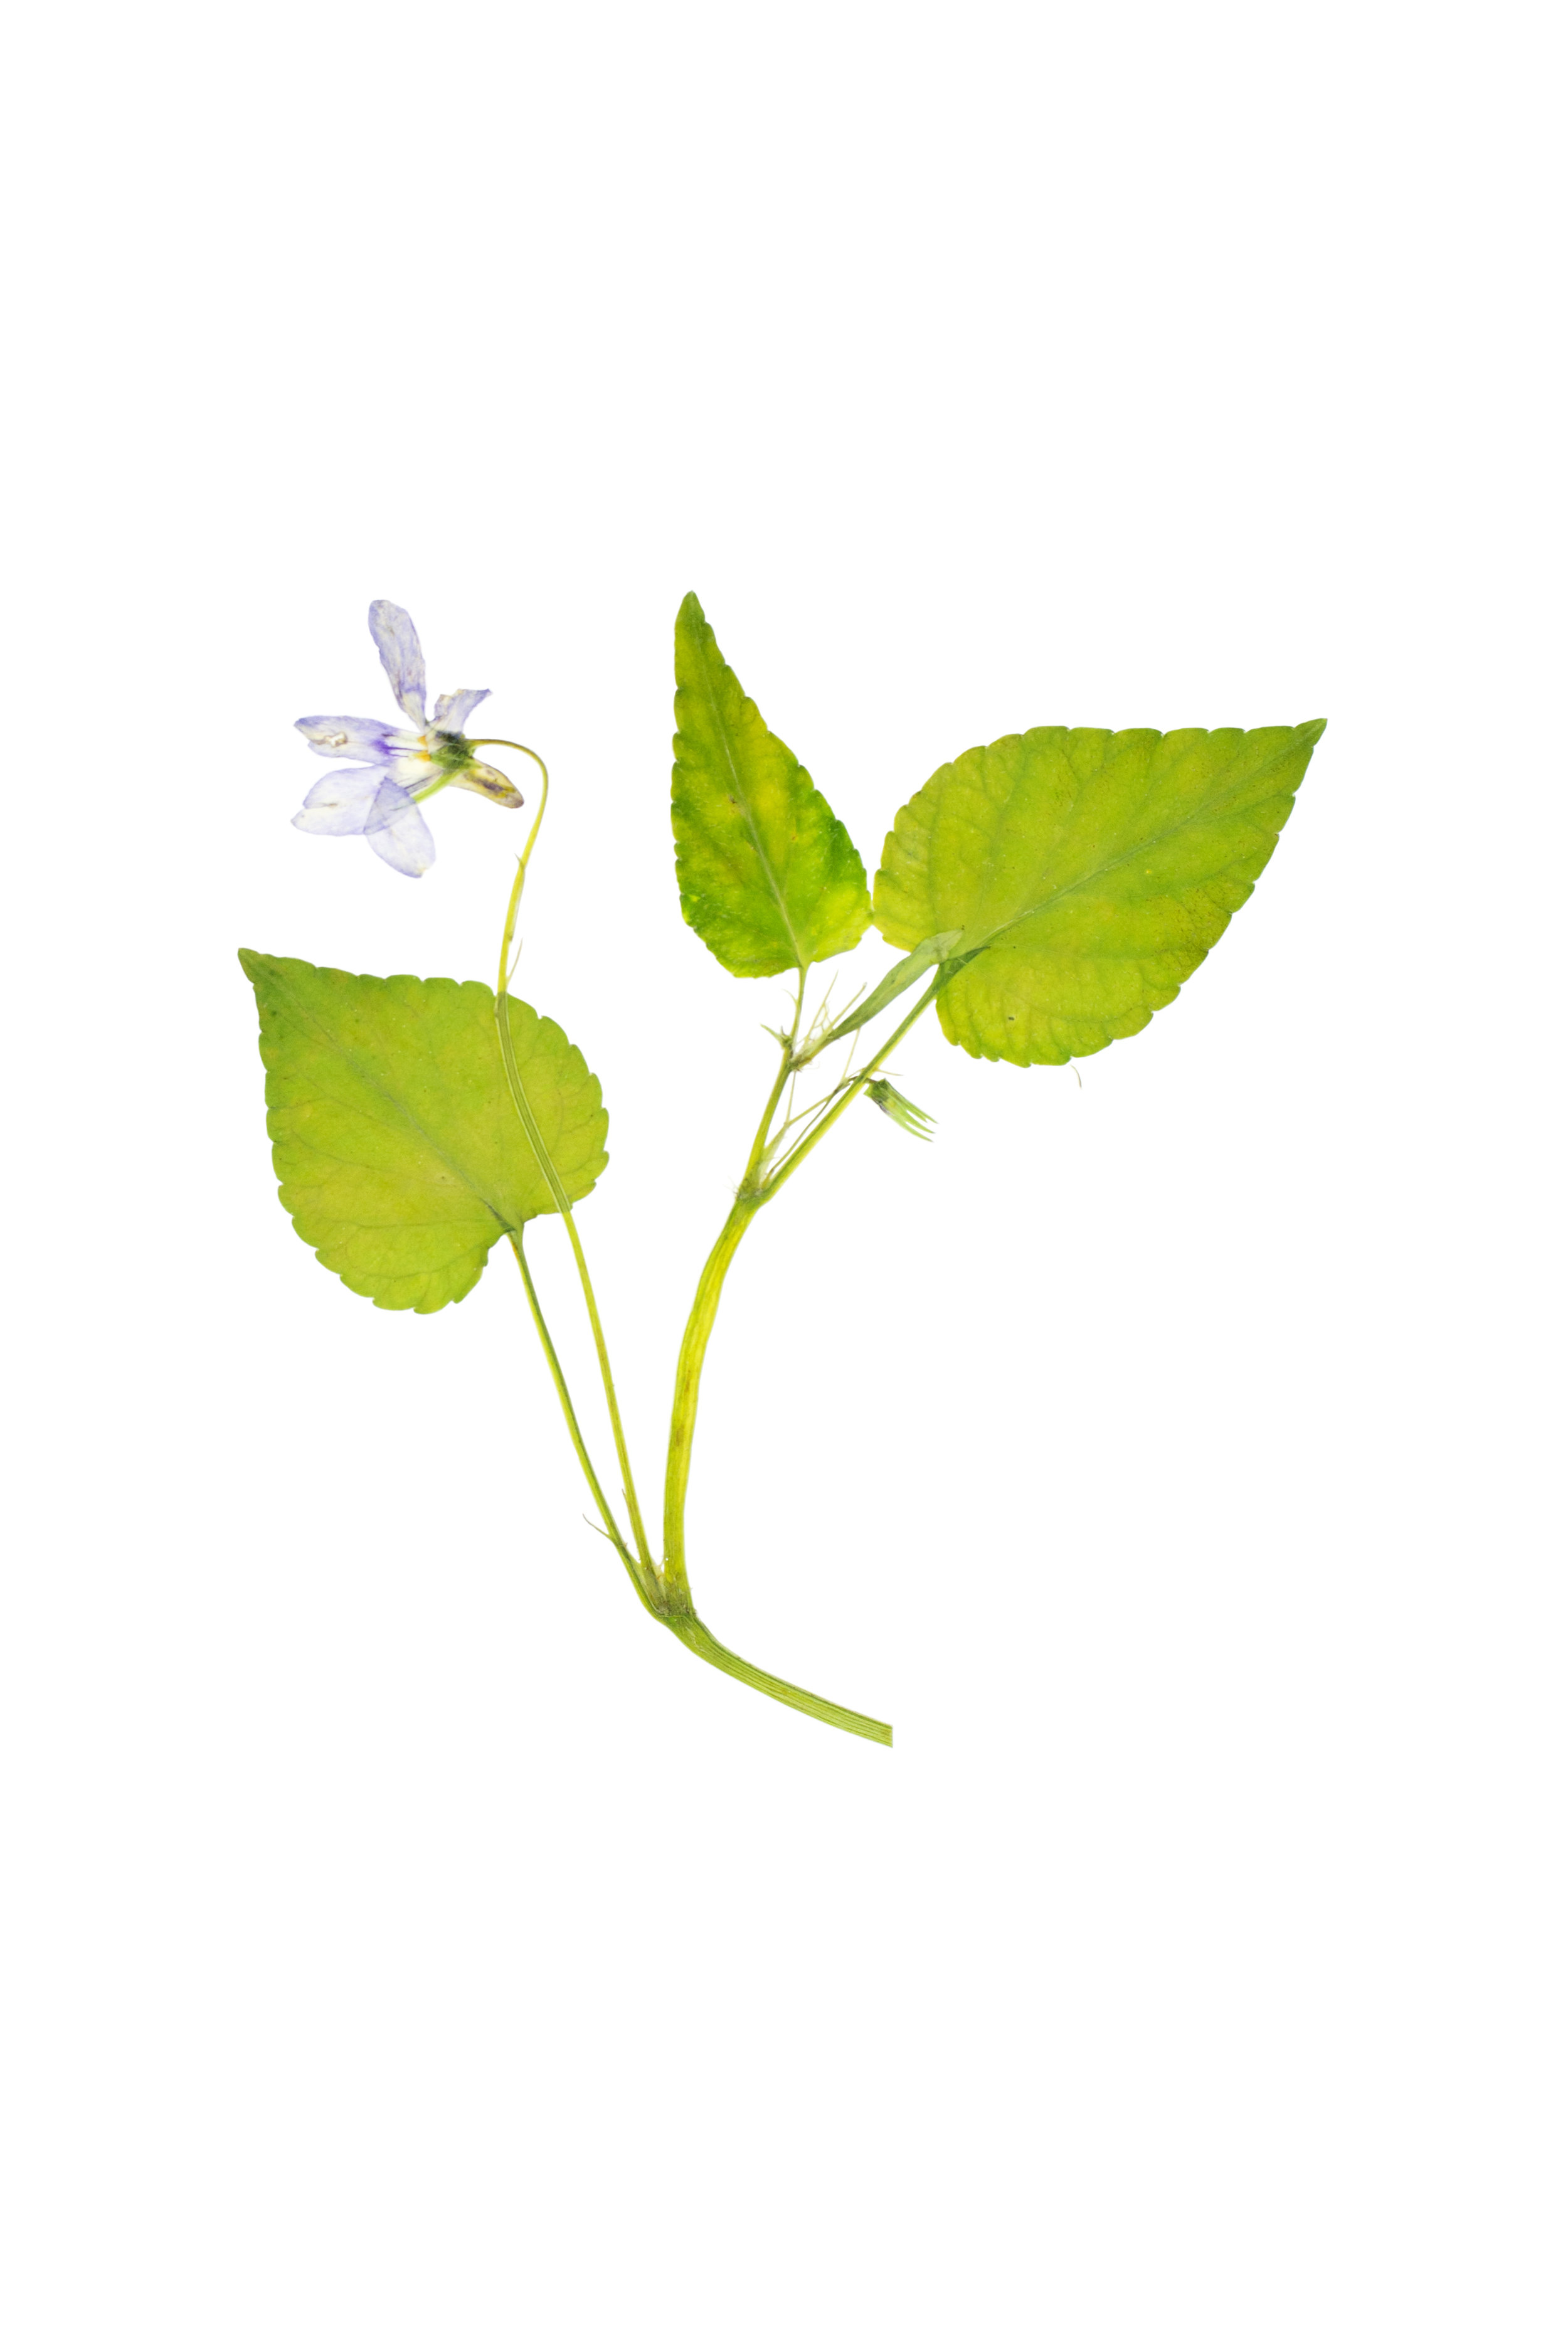 Common Dog Violet / Viola riviniana